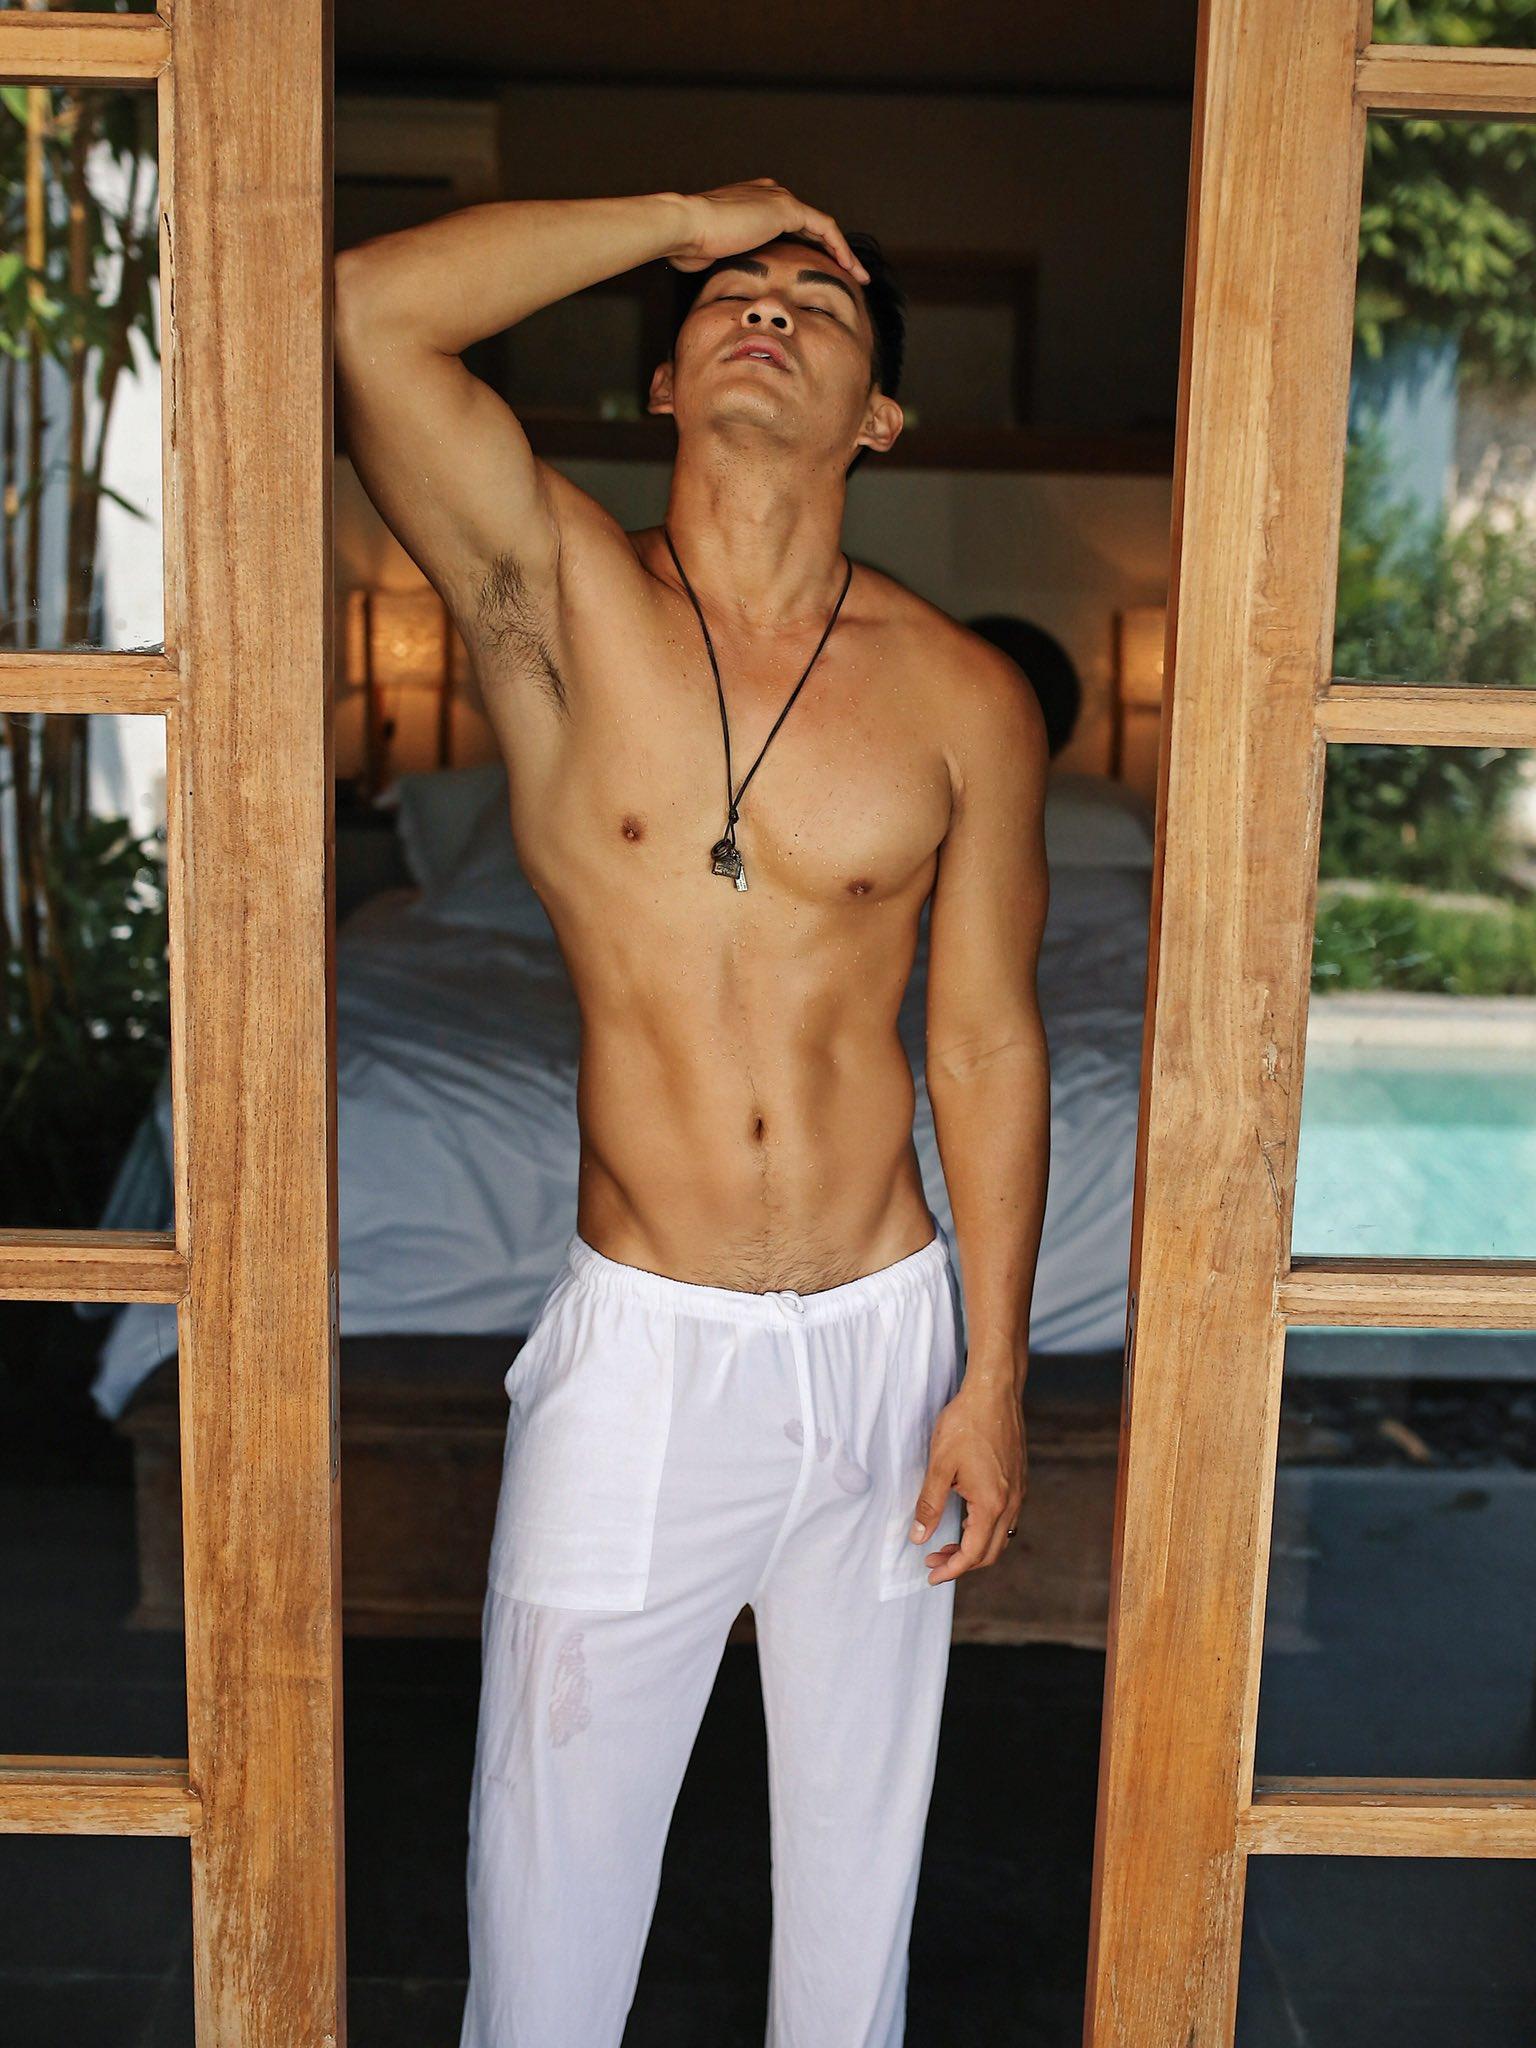 2011 - 2012 | Manhunt - Mister International - Mister Universe Model | Hawaii - USA | Rhonee Rojas - Page 35 EMYABttUwAAOH-T?format=jpg&name=4096x4096